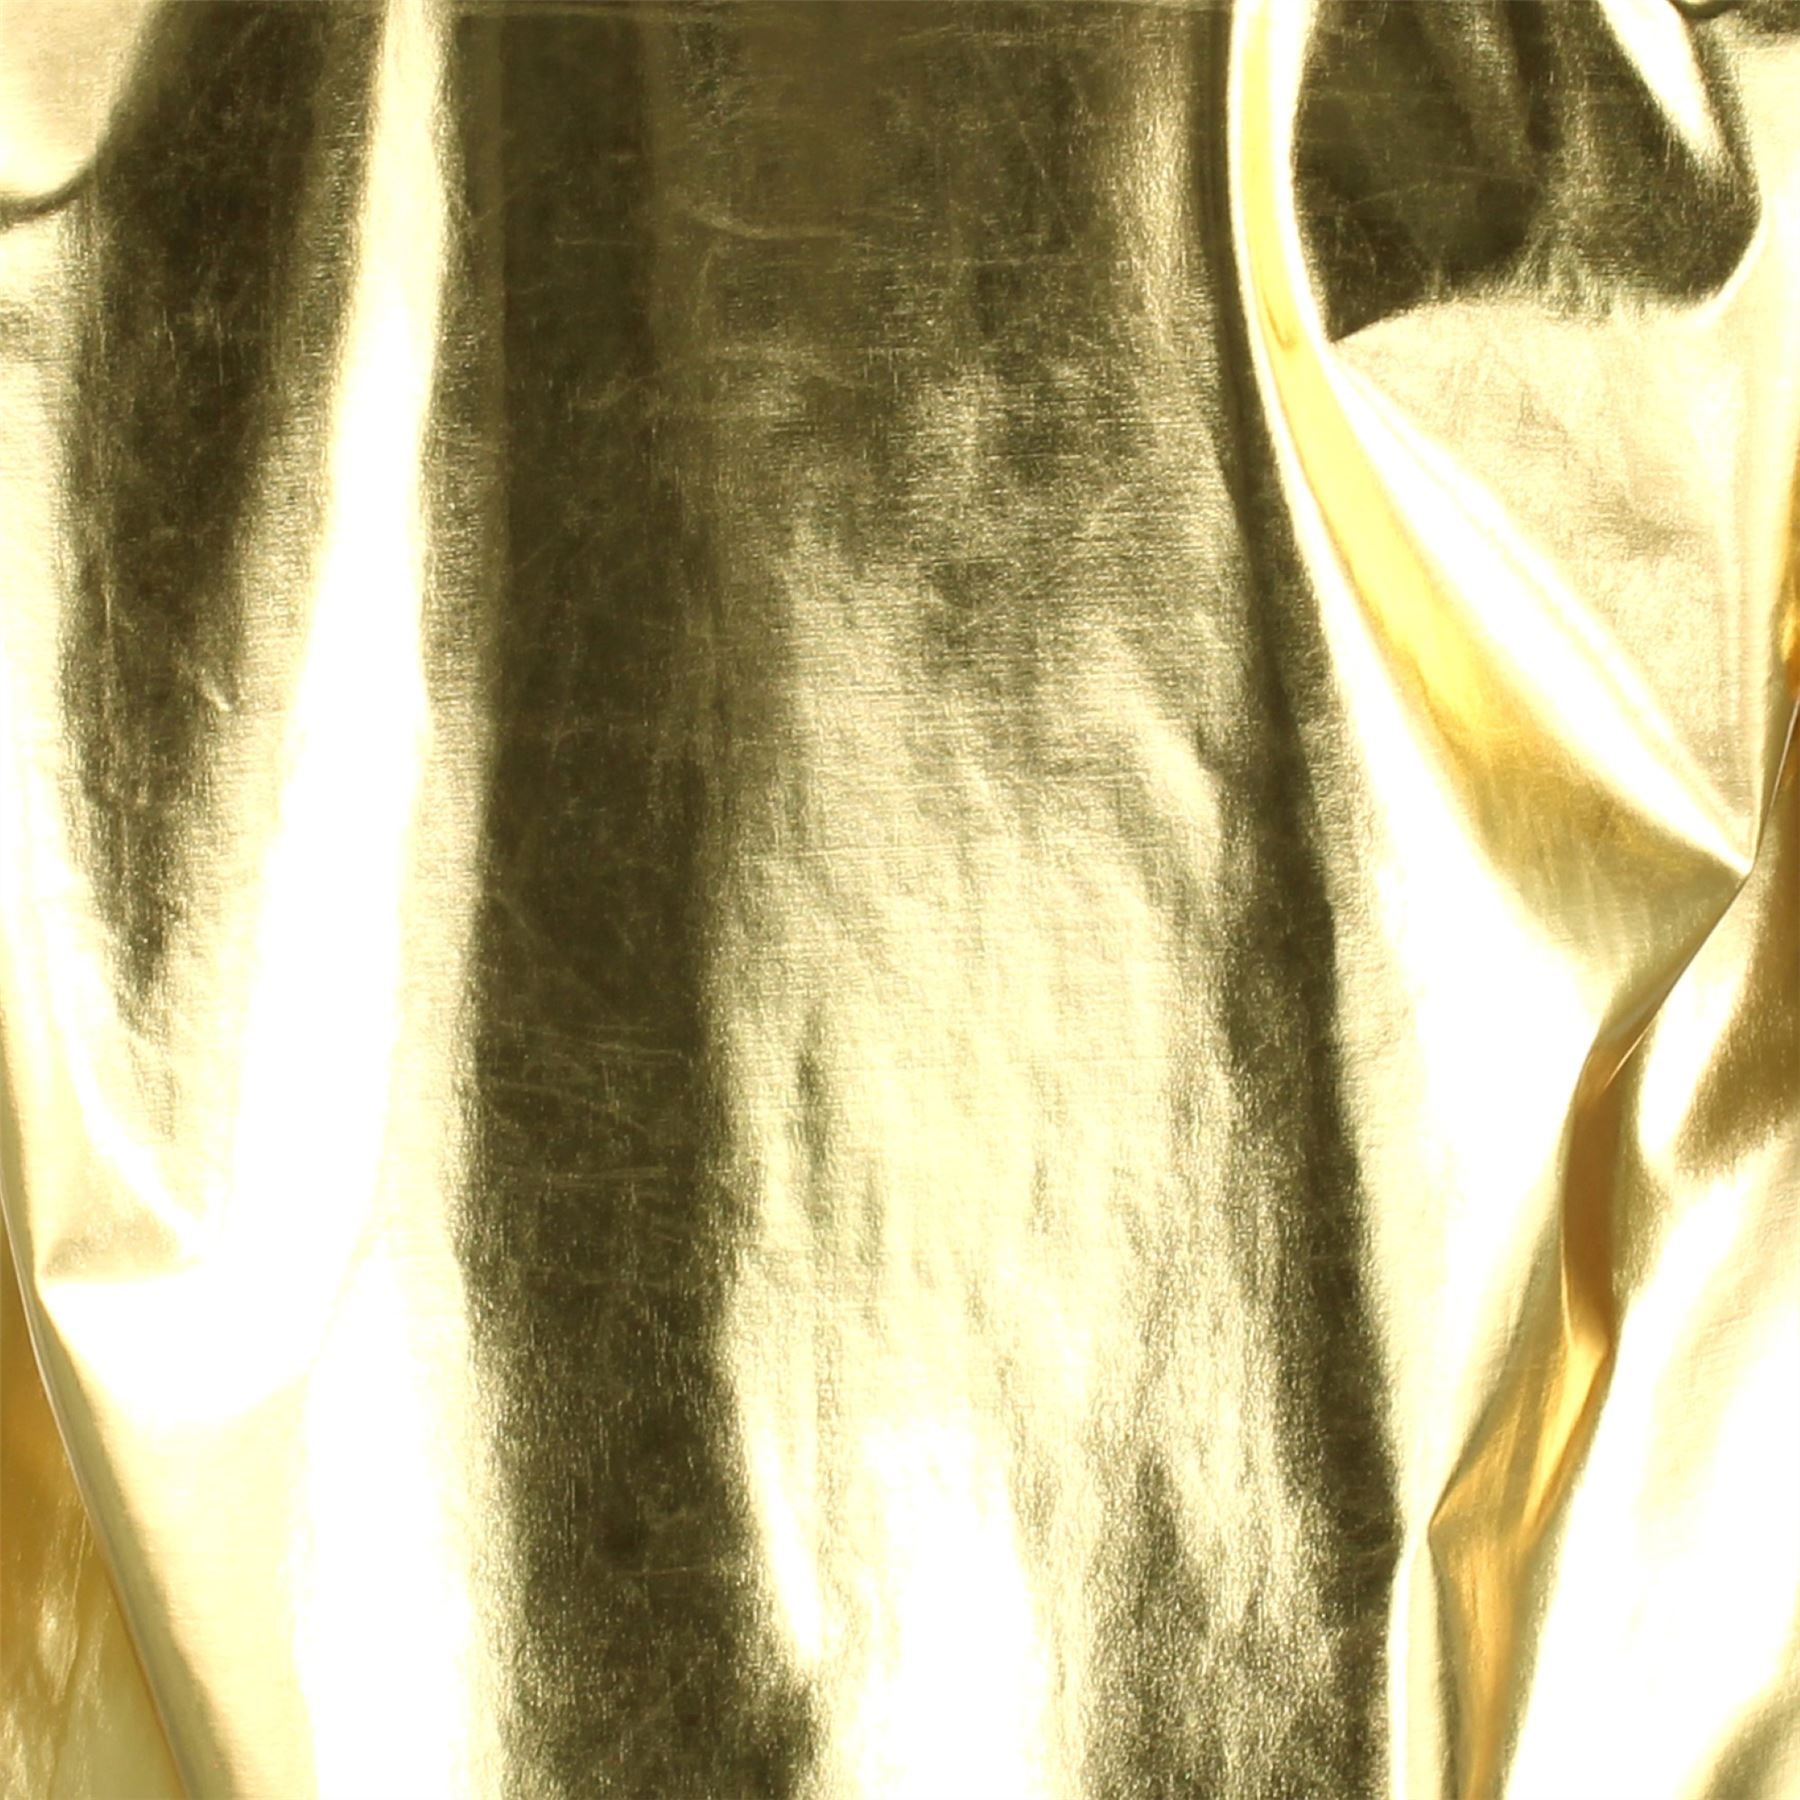 Shiny Metallic Short Sleeve Shirt Firefly Party Dressing up